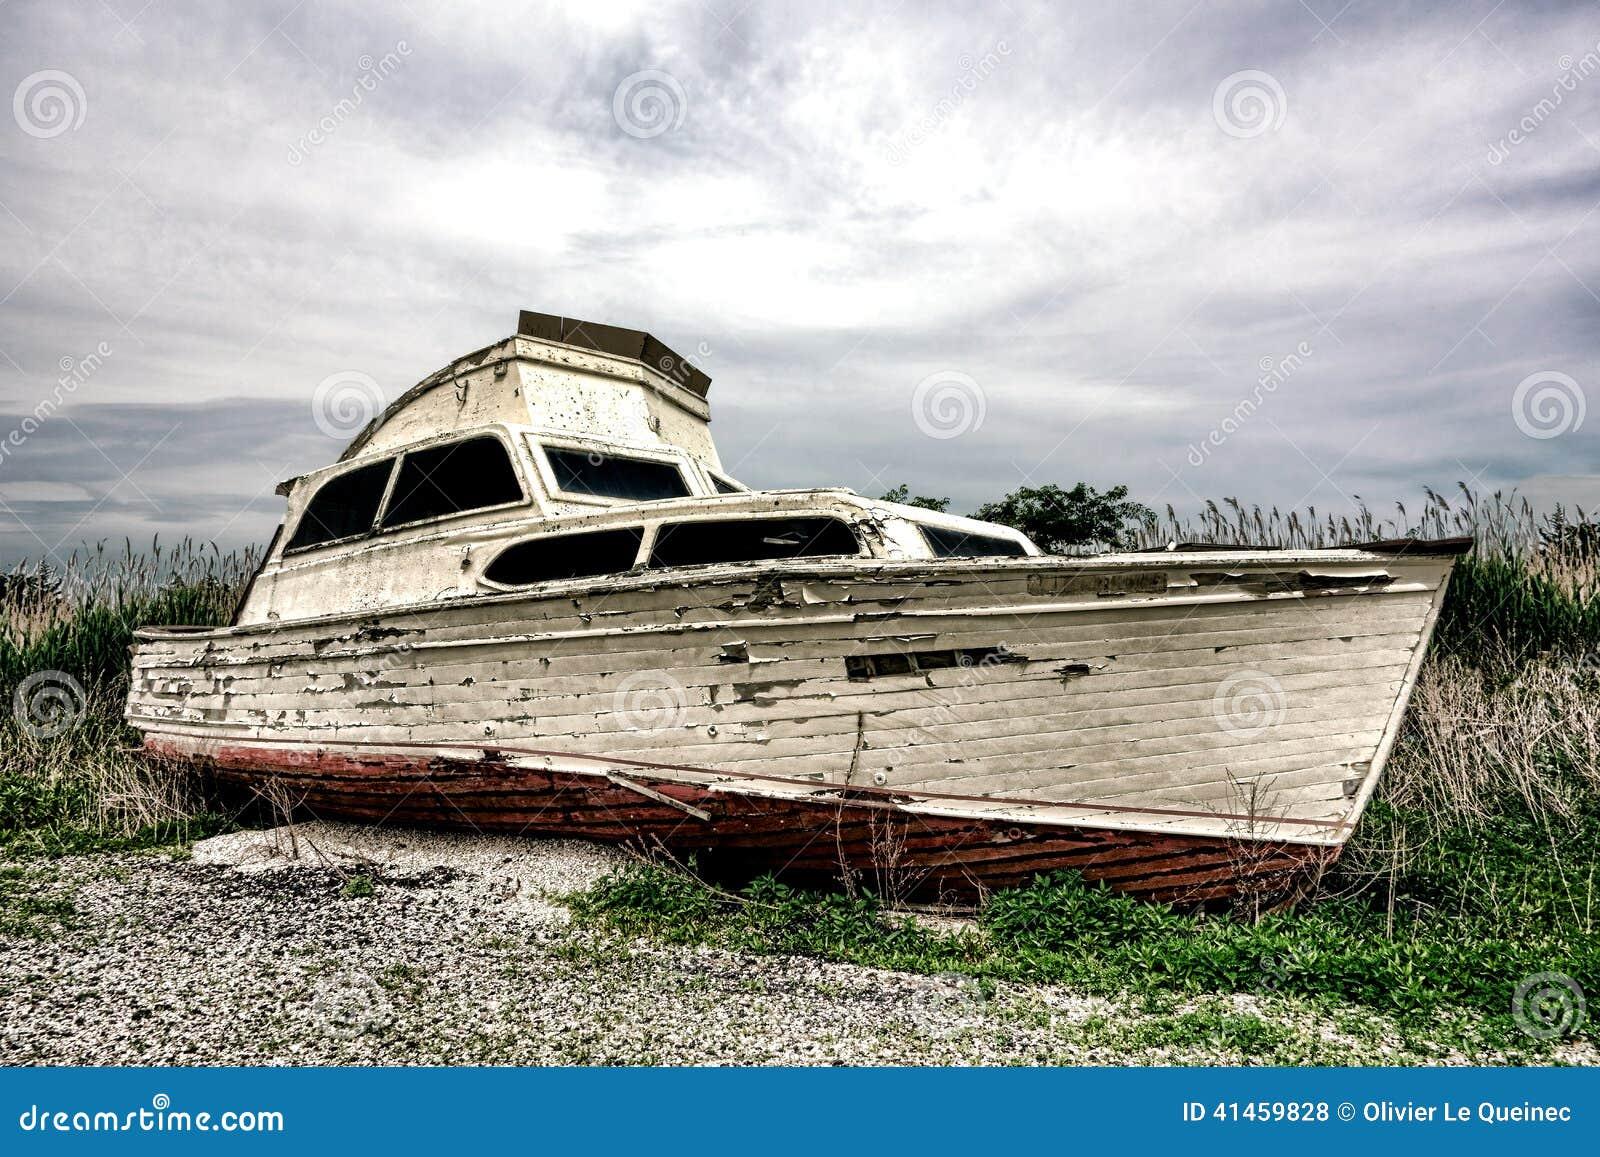 Old Abandoned Pleasure Recreational Boat On Land Stock Photo - Image: 41459828